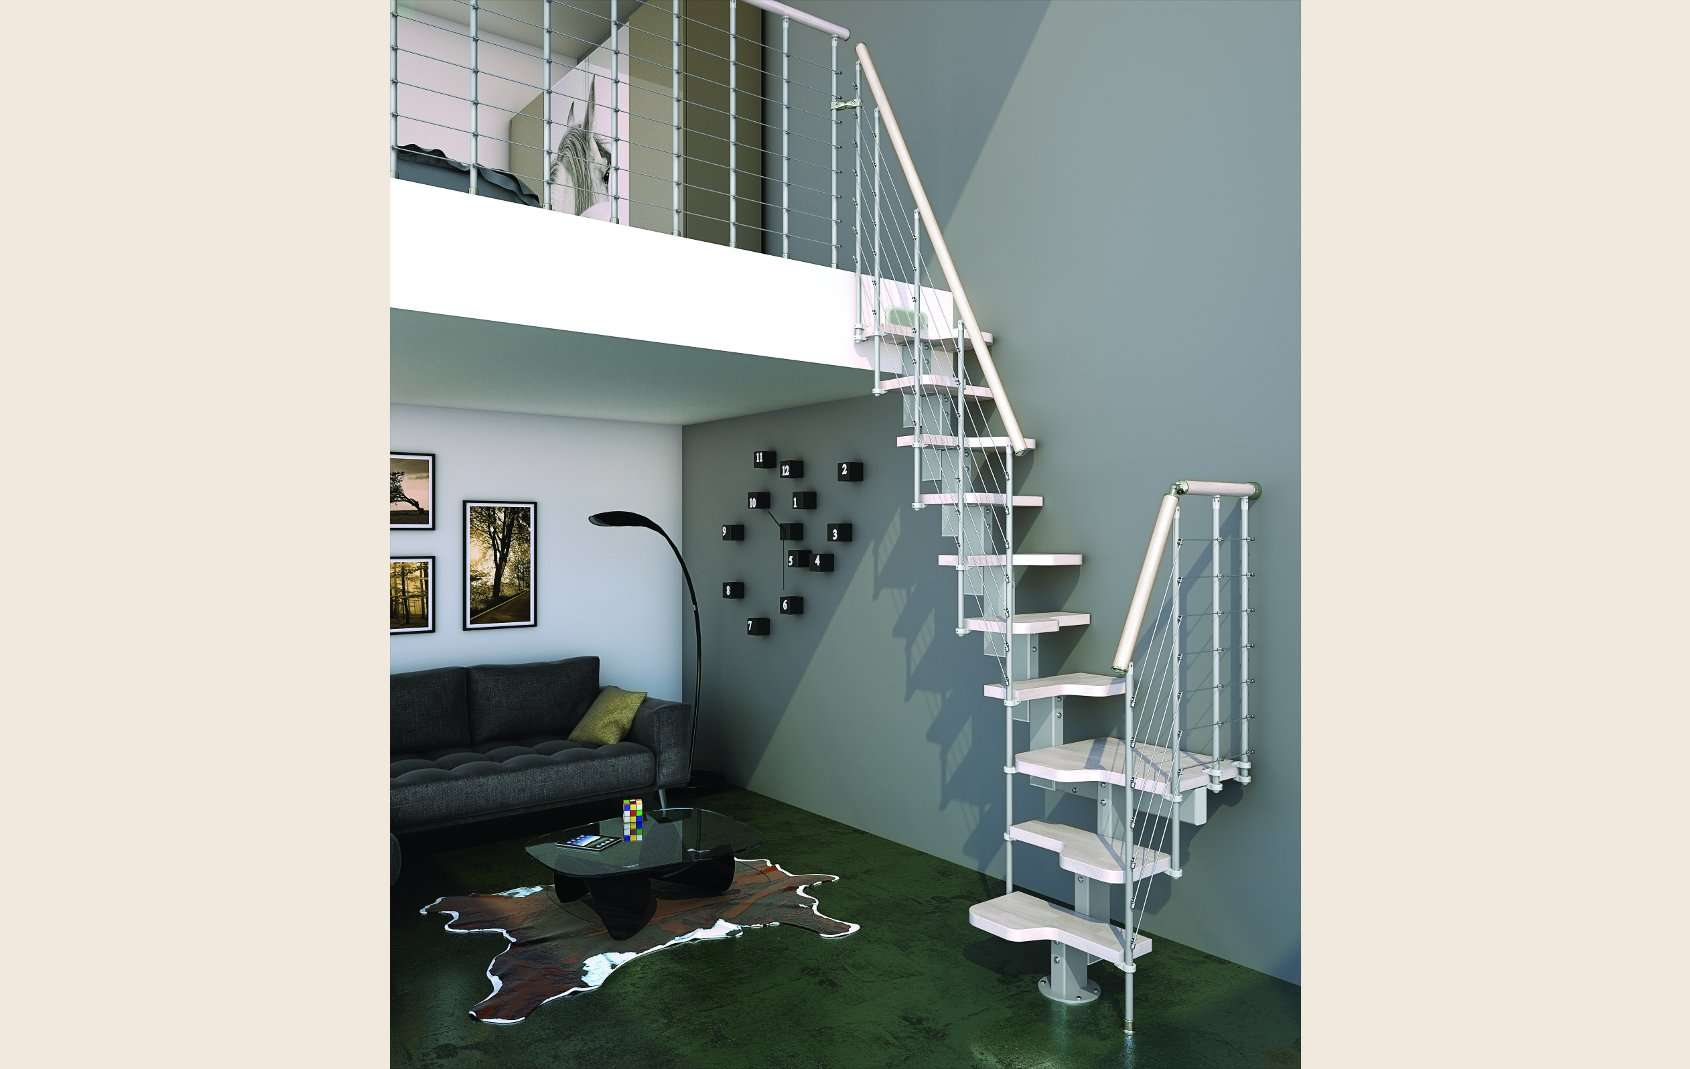 Escaleras italianas escaleras de madera maciza - Escaleras espacios pequenos ...